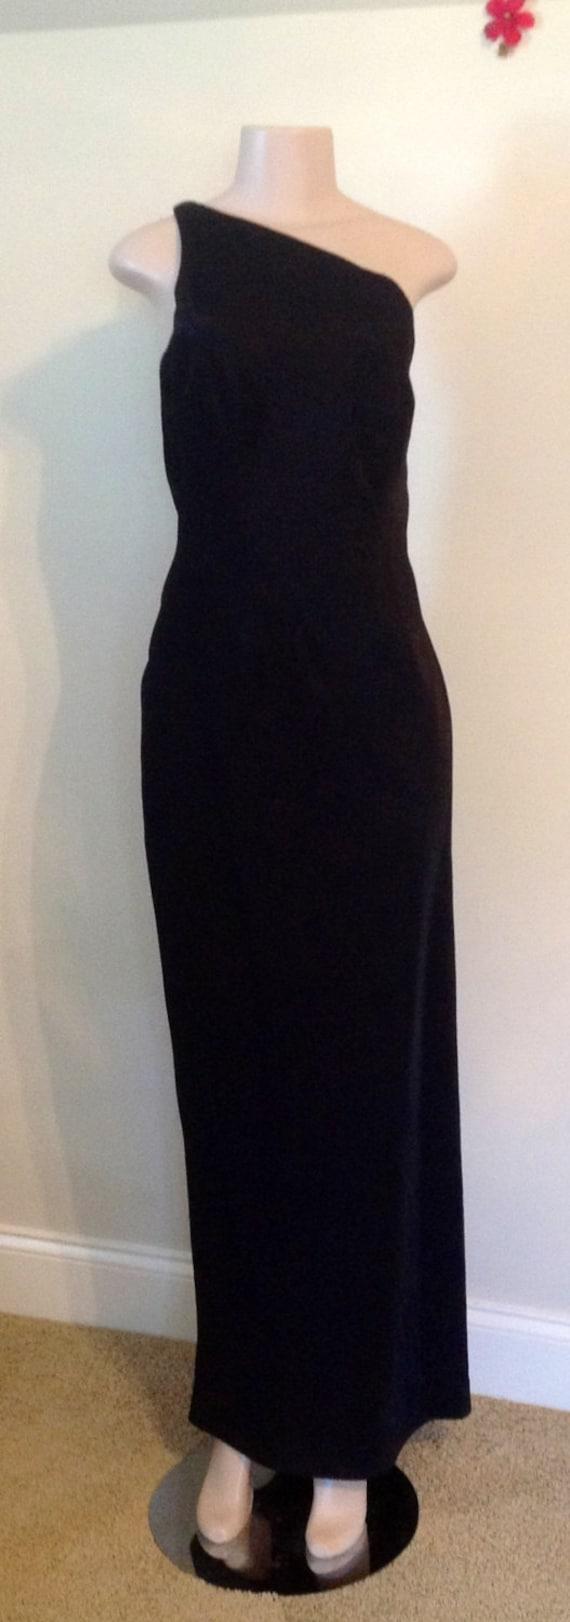 Black Long  Marien St. Claire Formal Gown - image 1